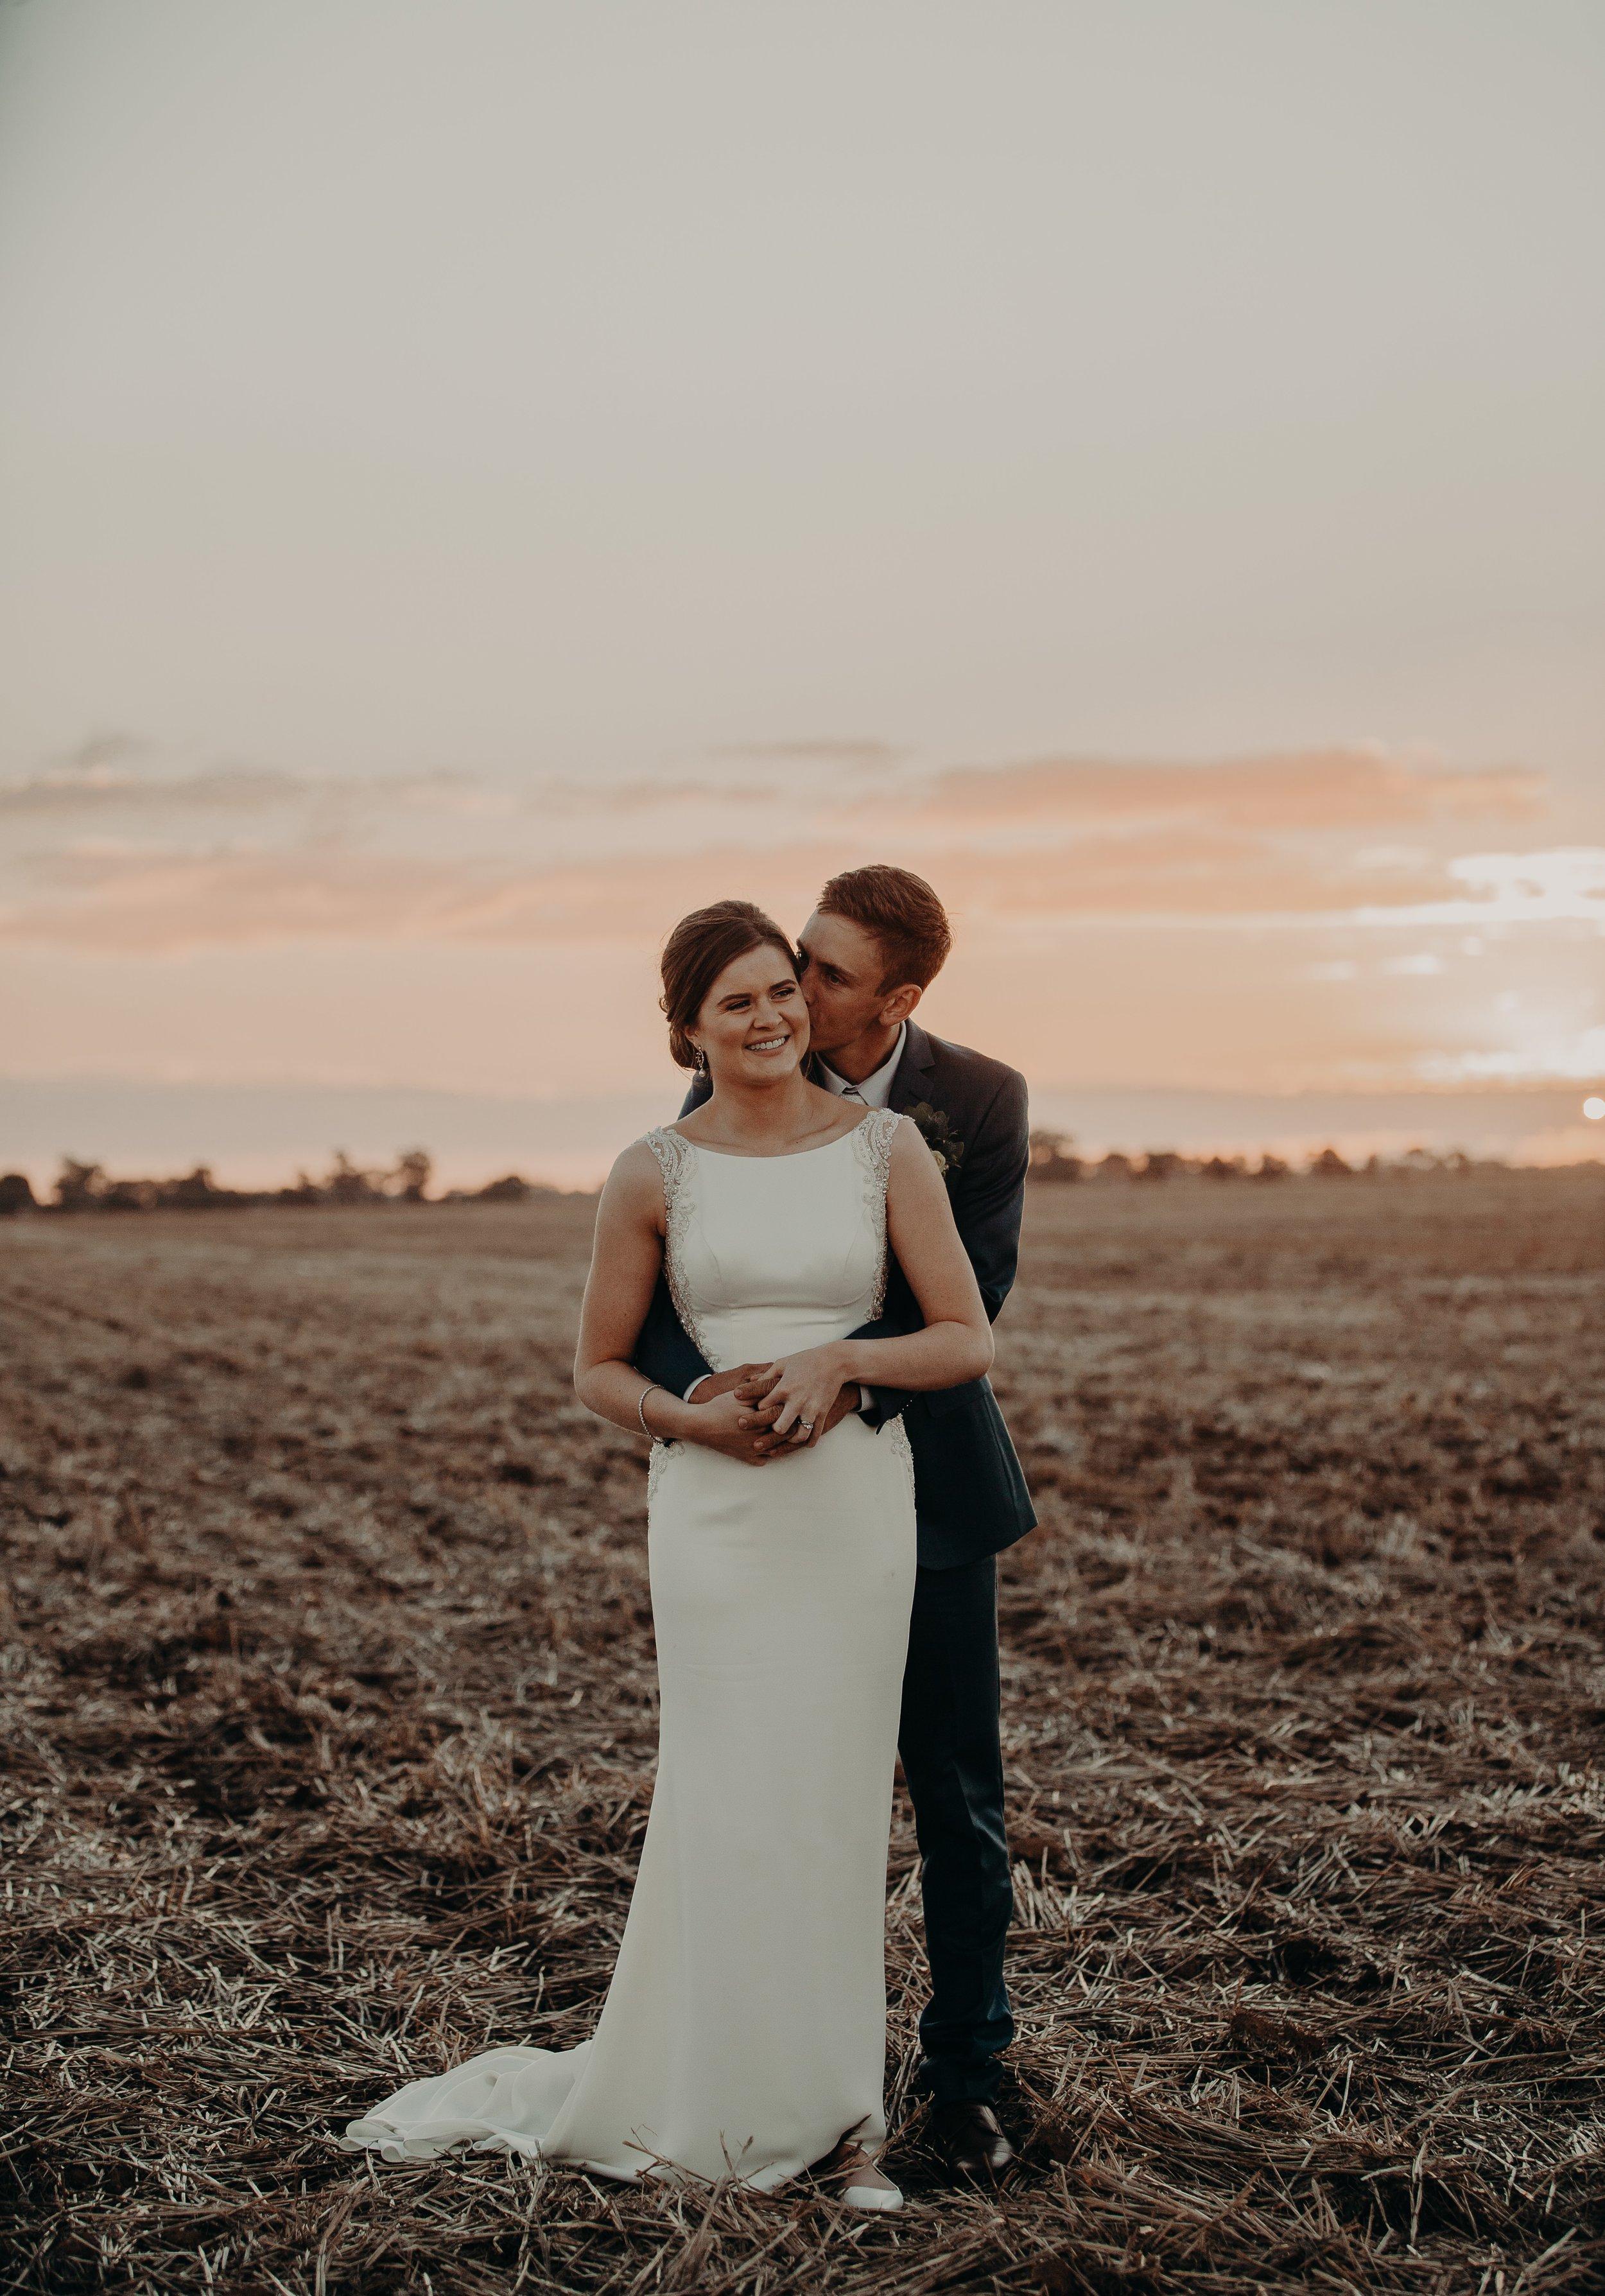 mickalathomas_puremacphotography_weddingphotographer_couplephotographer_Sheppartonphotographer_2574.jpg